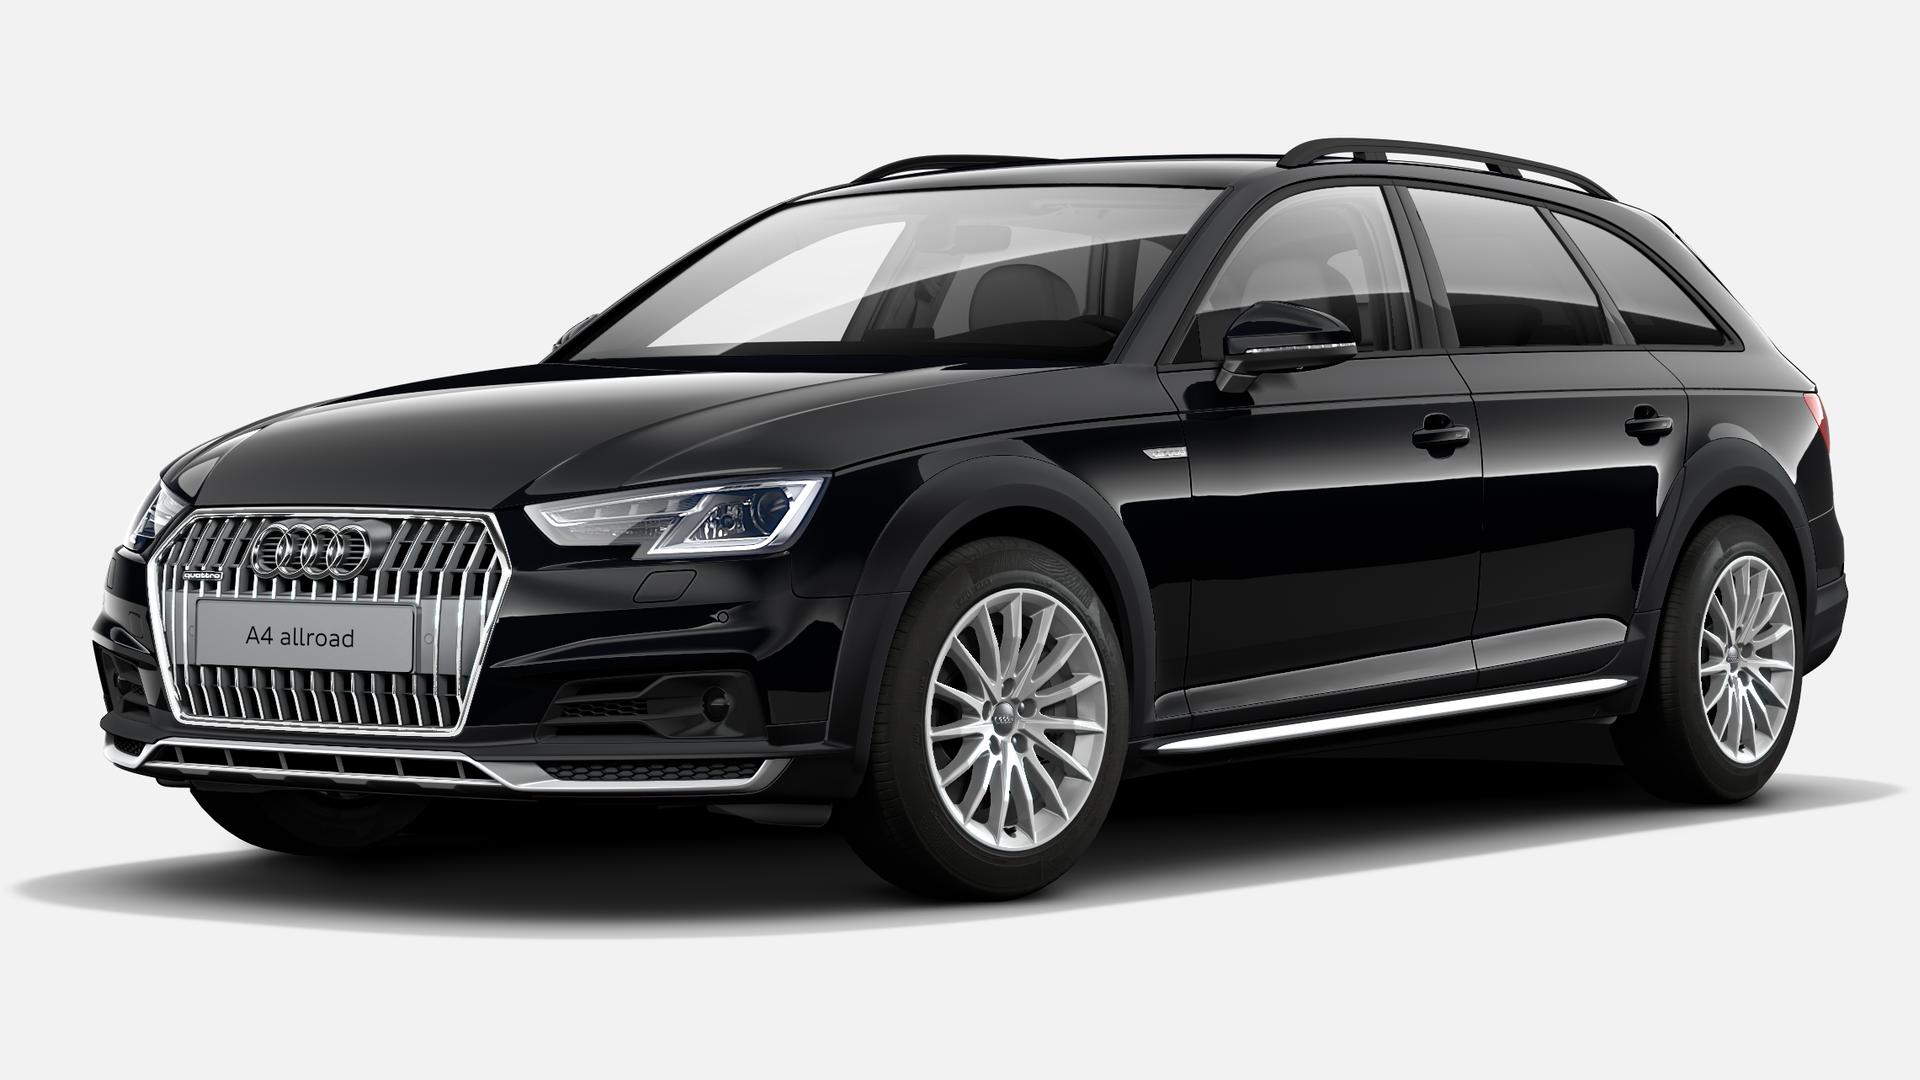 Audi A4 Allroad 2.0 TDI unlimited quattro S tronic 140 kW (190 CV)  nuevo en Guipuzcoa